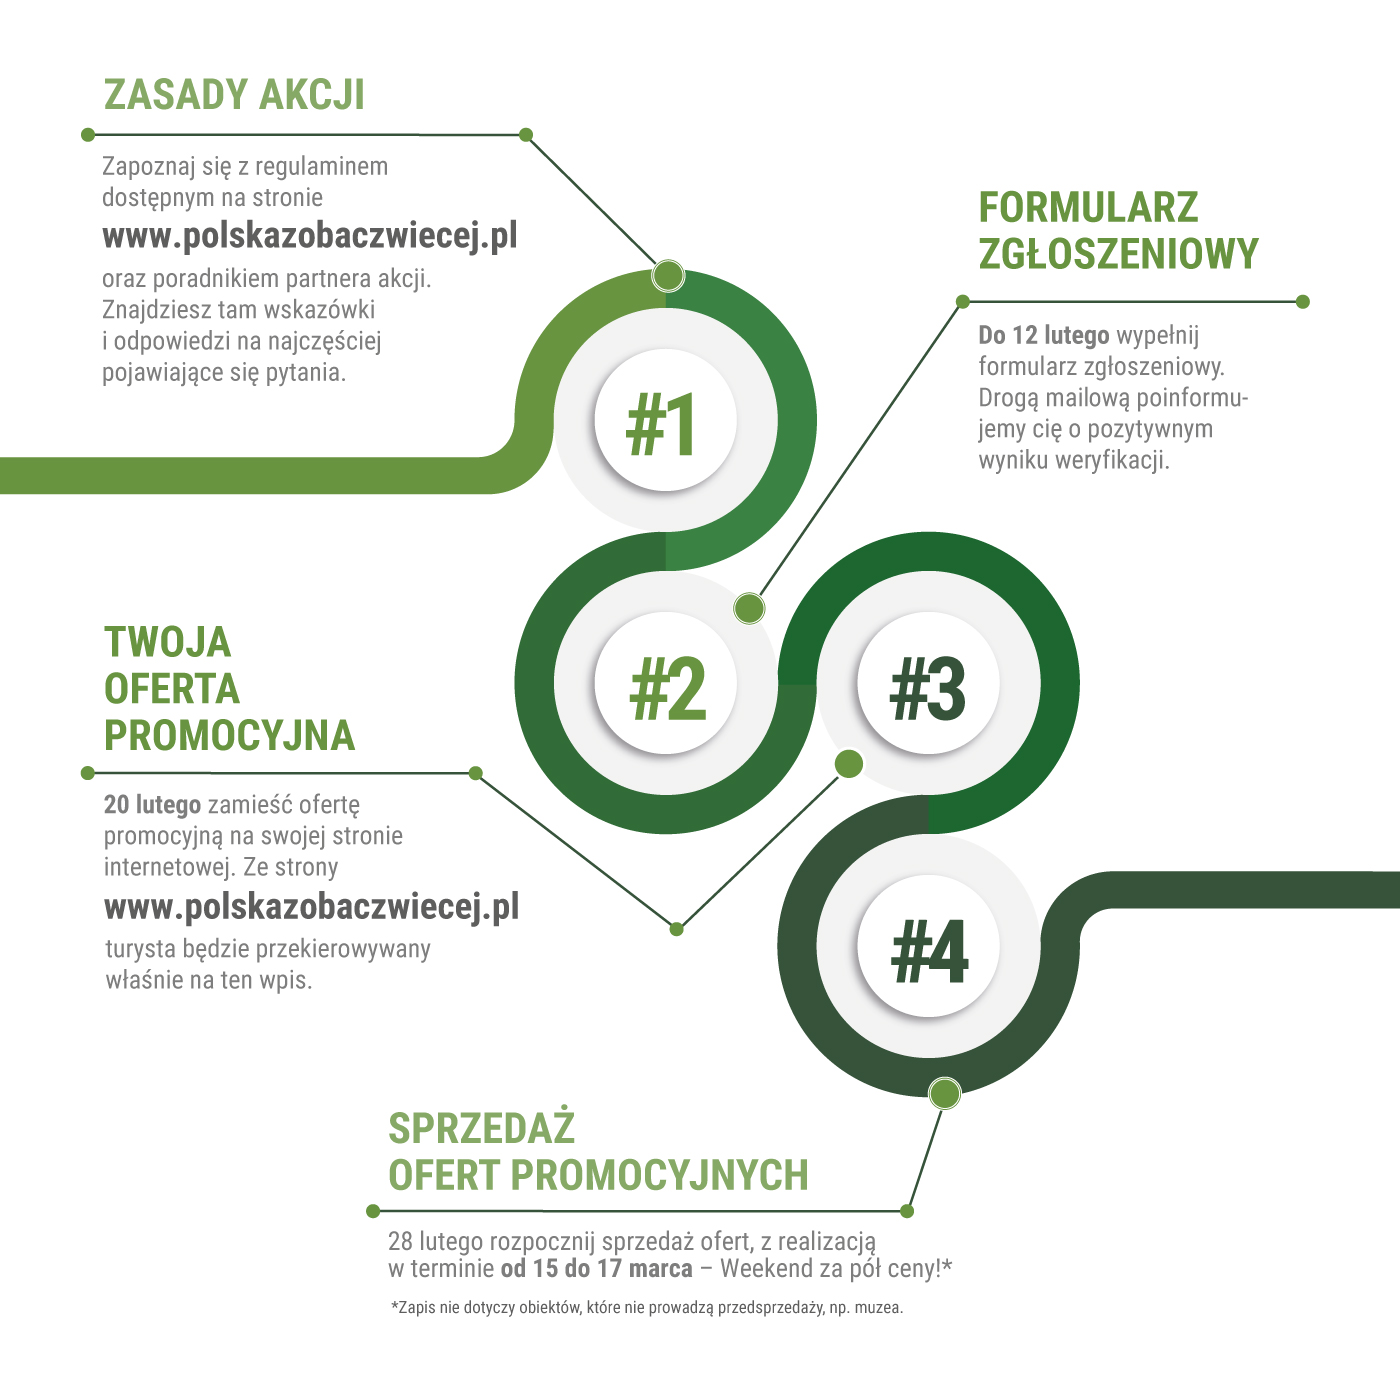 http://m.82-200.pl/2019/01/orig/02-18-00000124-pzw-infografika-2-4046.jpg